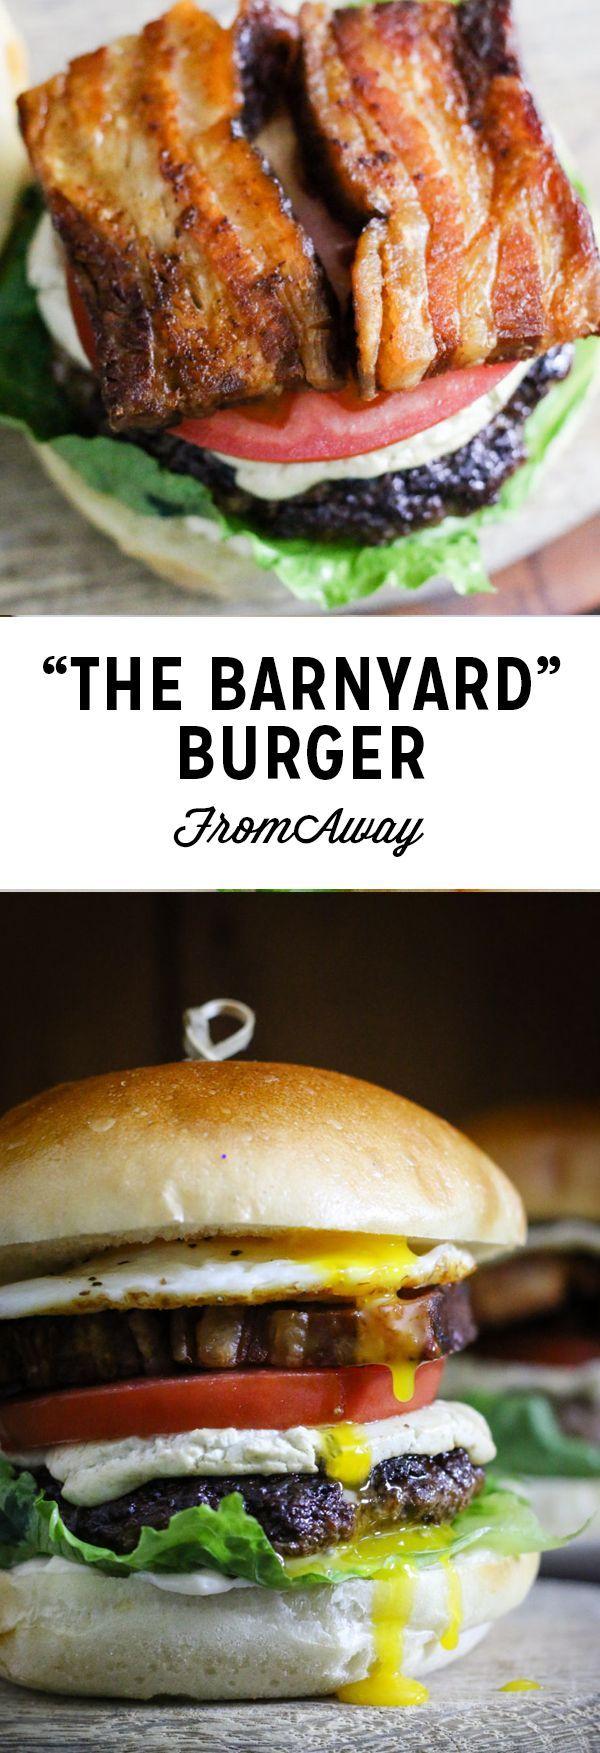 60 best images about sandwiches u0026 burgers on pinterest